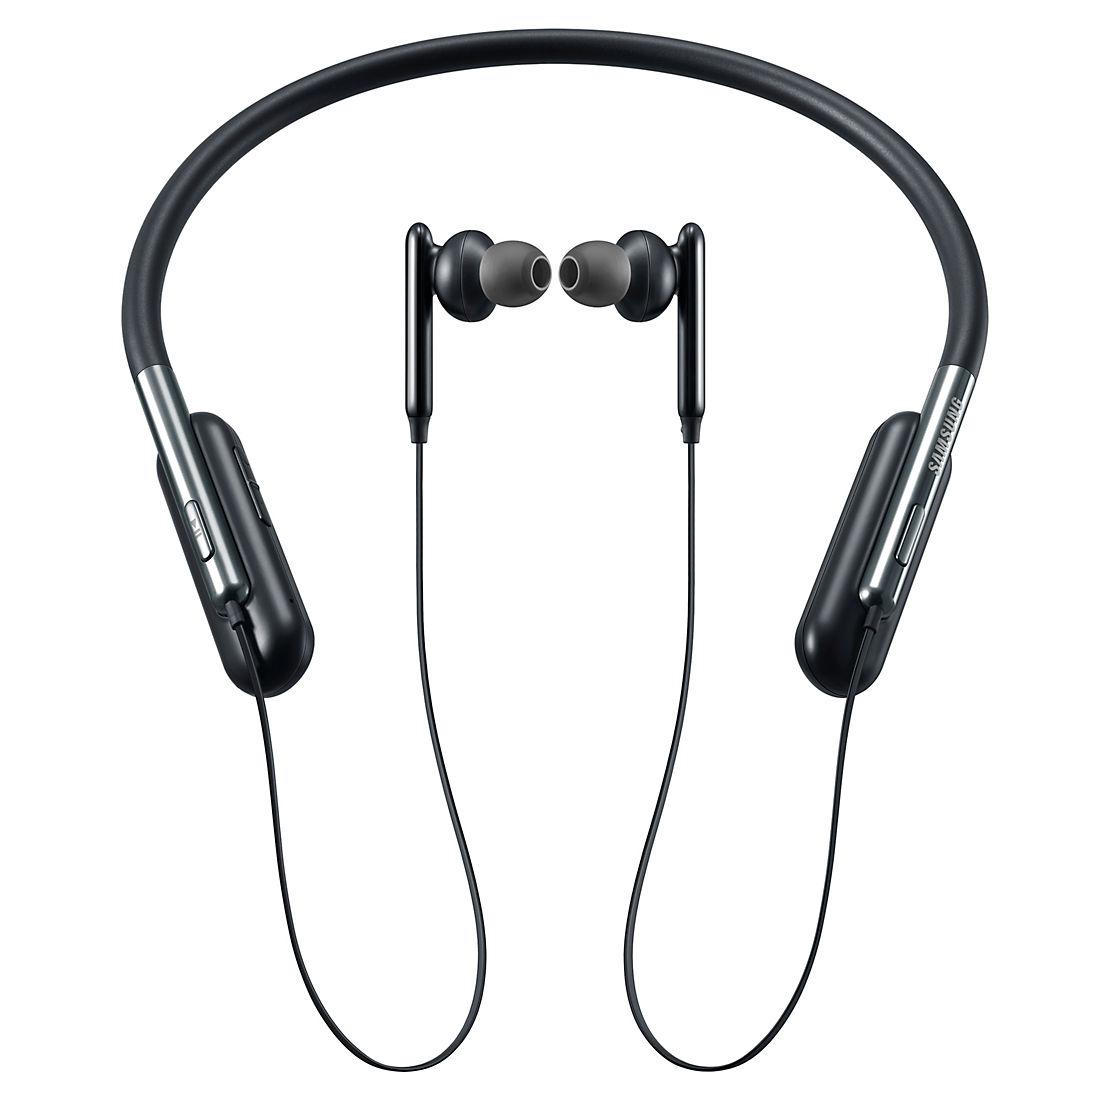 41c4a09e87c Samsung U Flex Bluetooth Wireless Headphones with Microphone - BJs ...